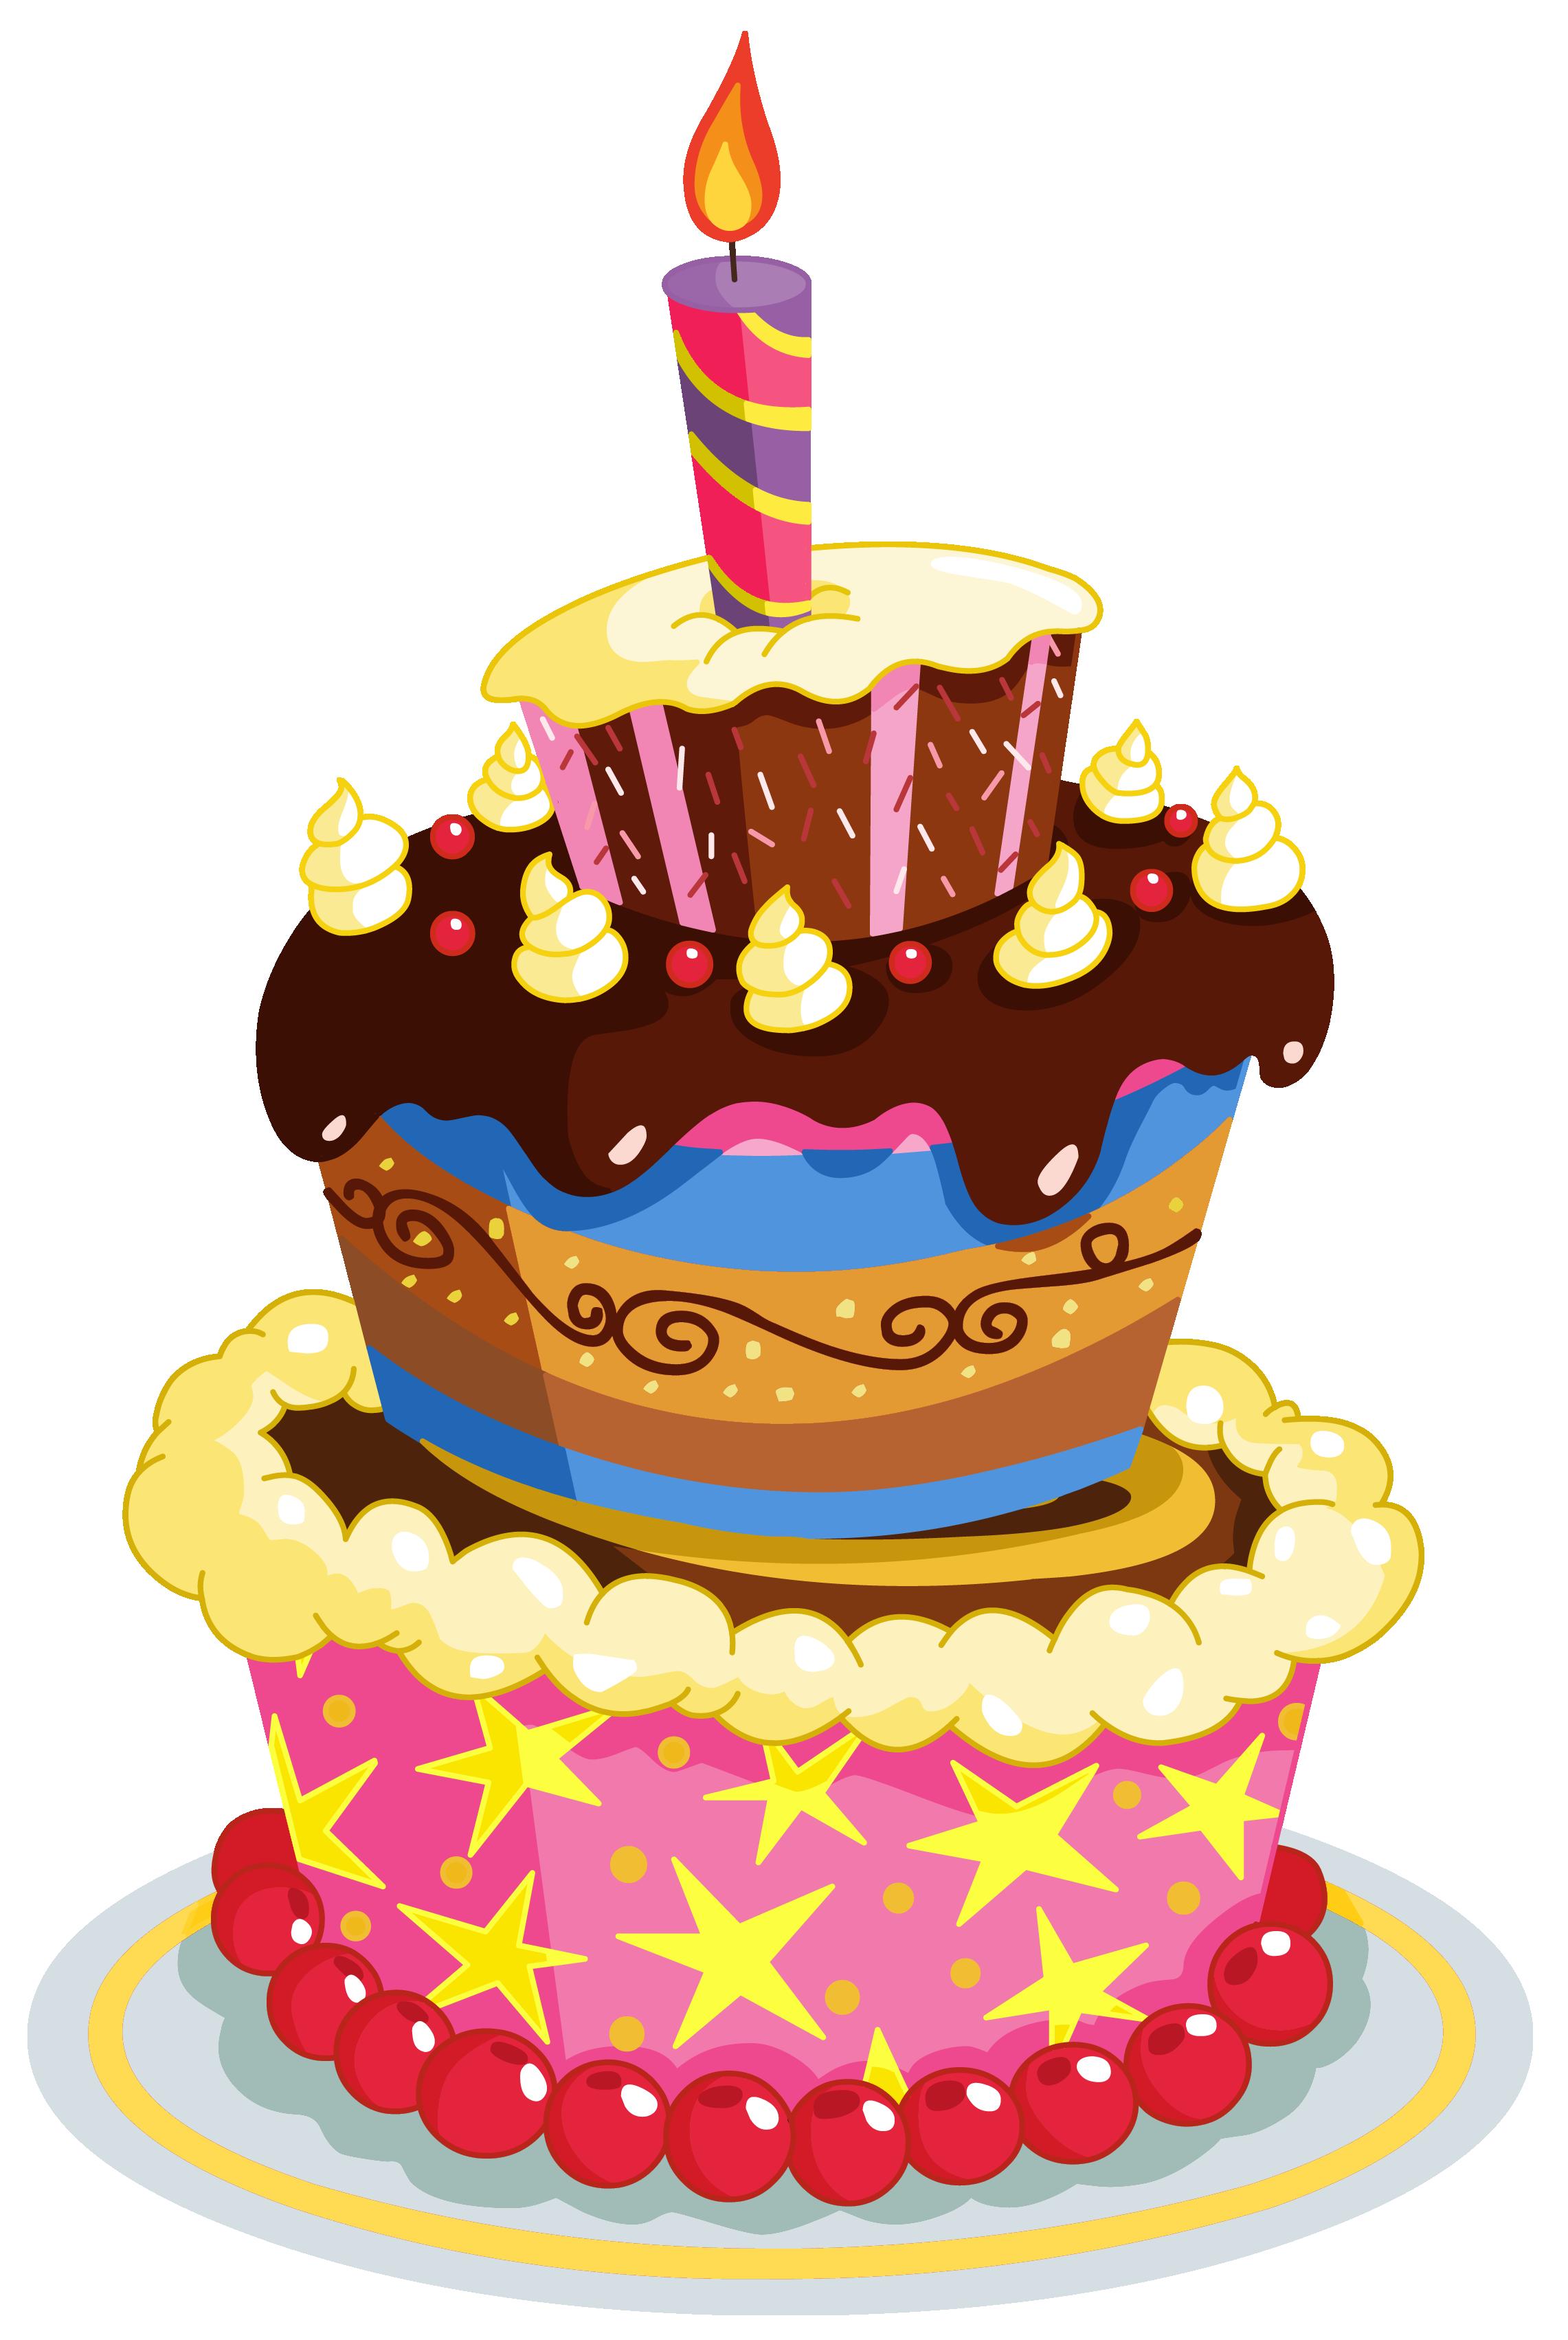 Colorful birthday cake clipart happy birthday